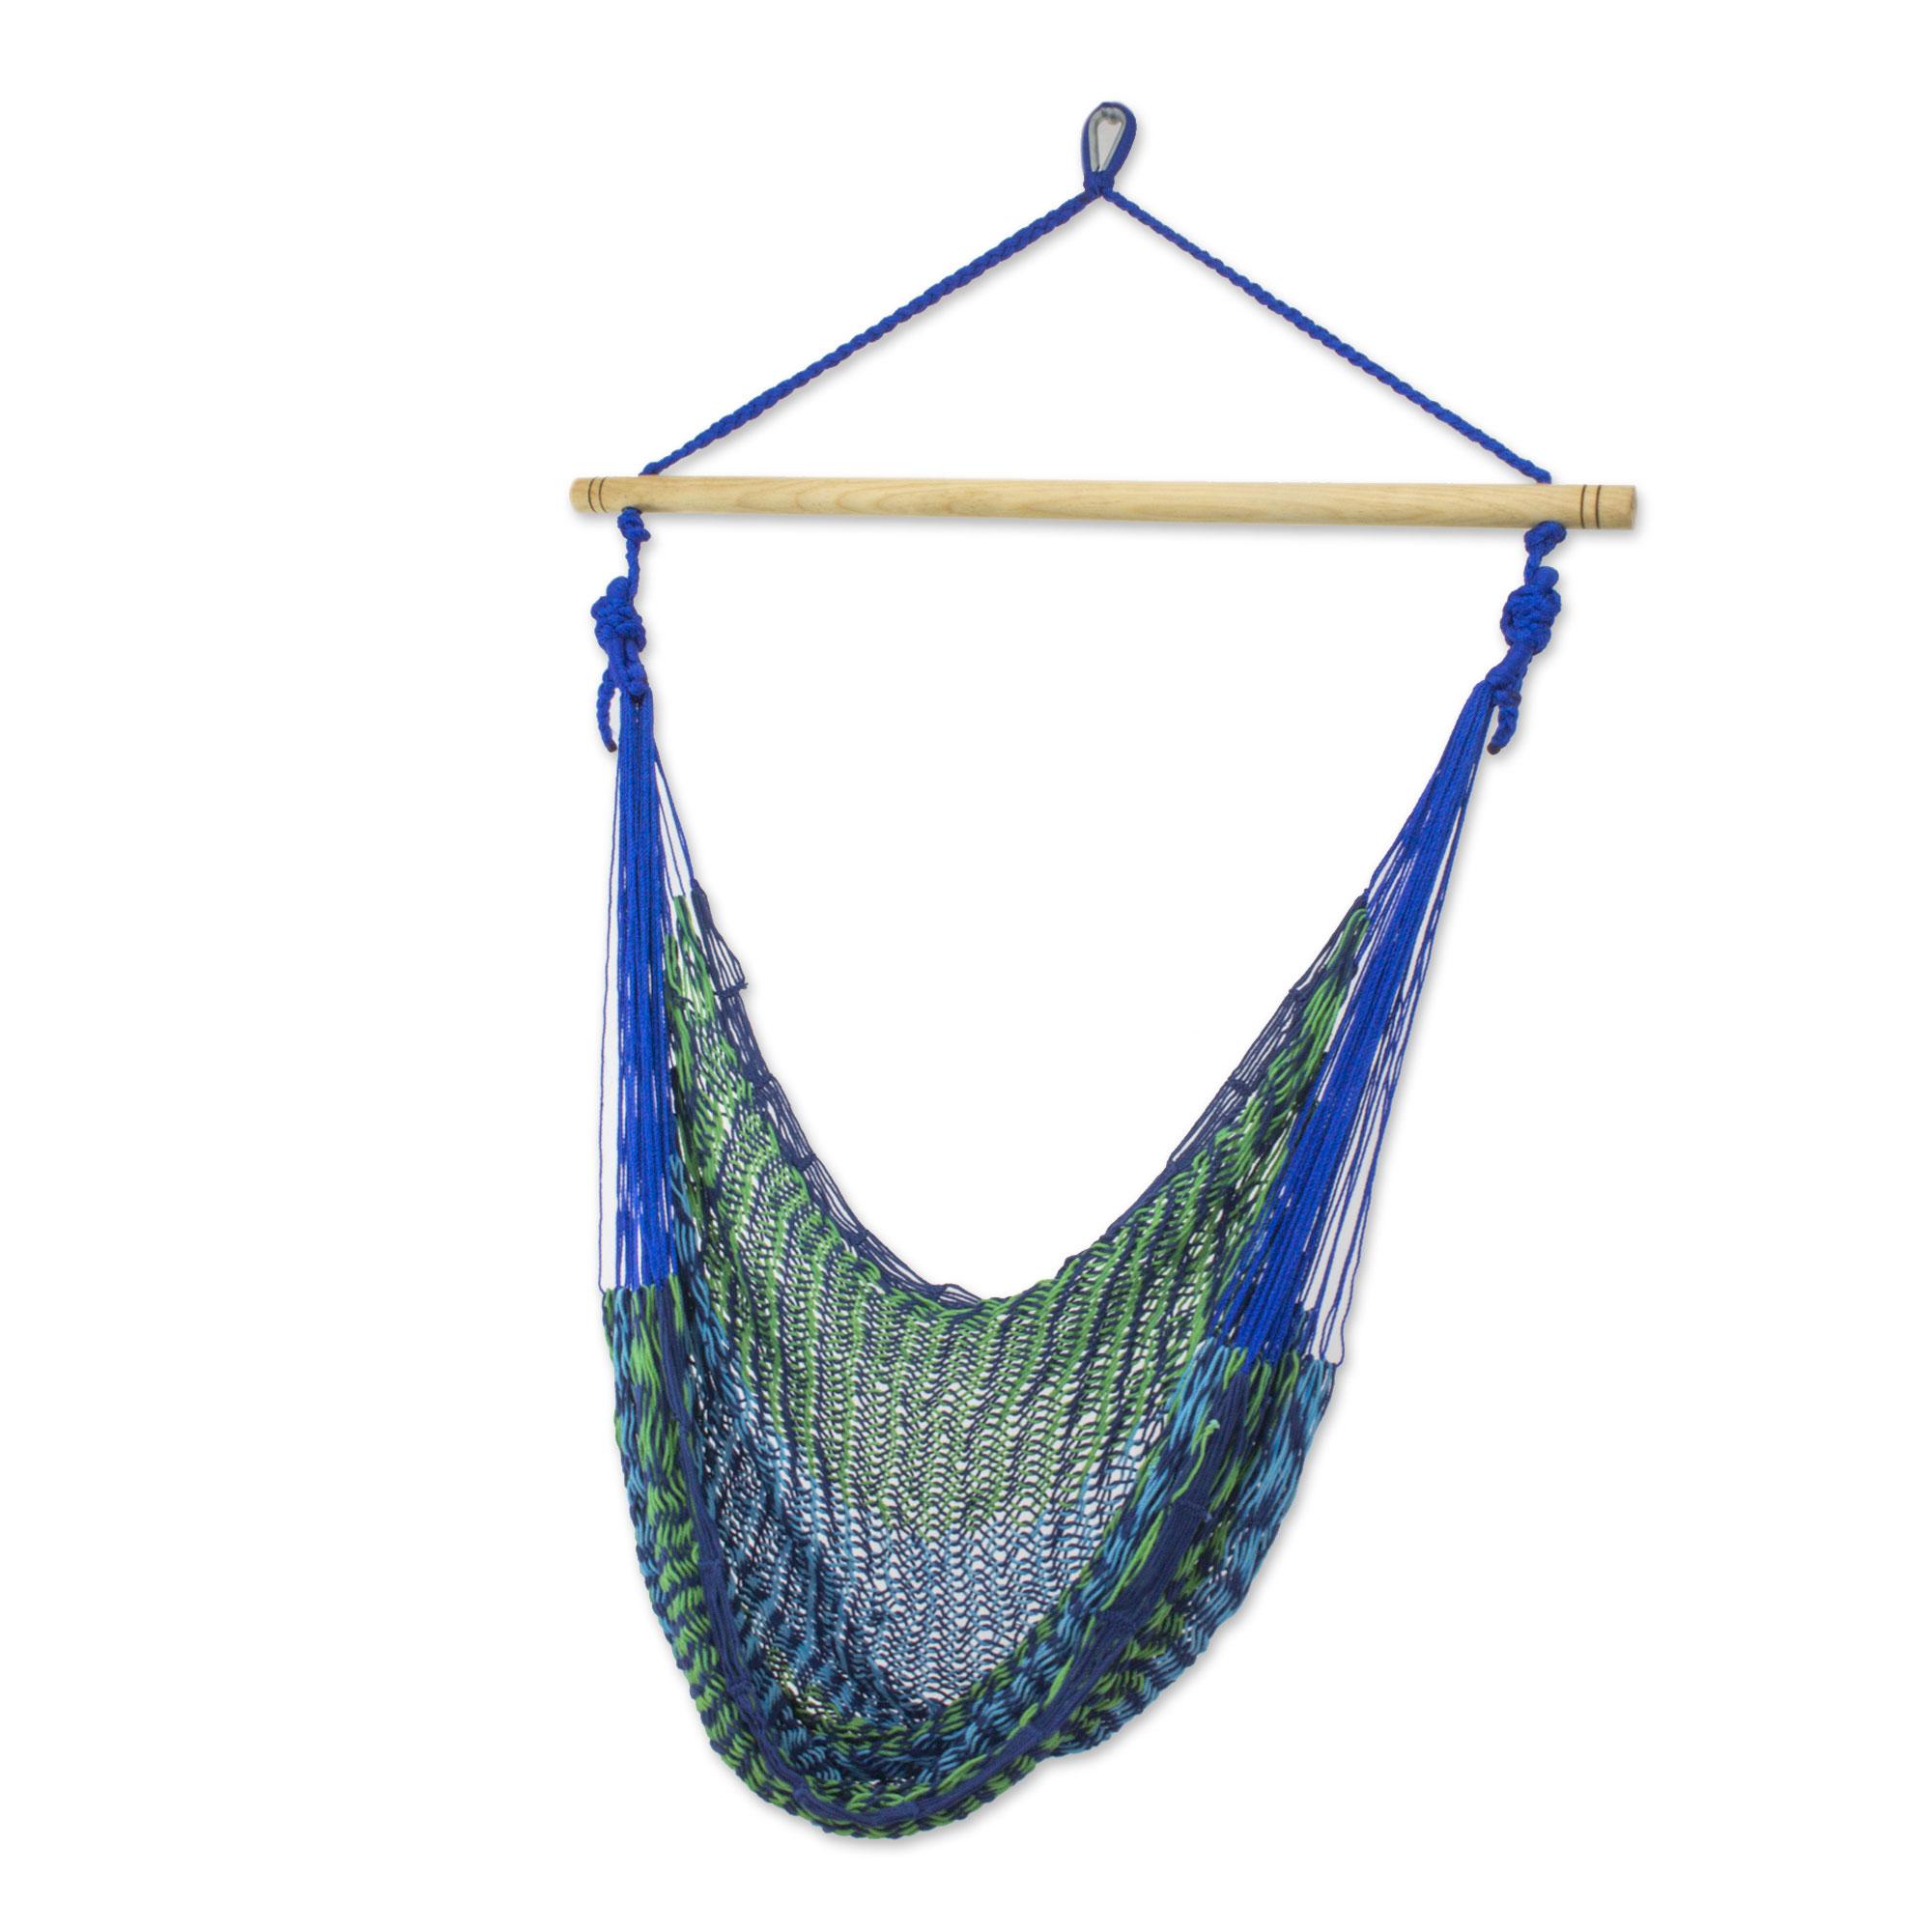 Mexican Blue Green Hand Woven Cotton Hammock Swing Chair Maya Breeze